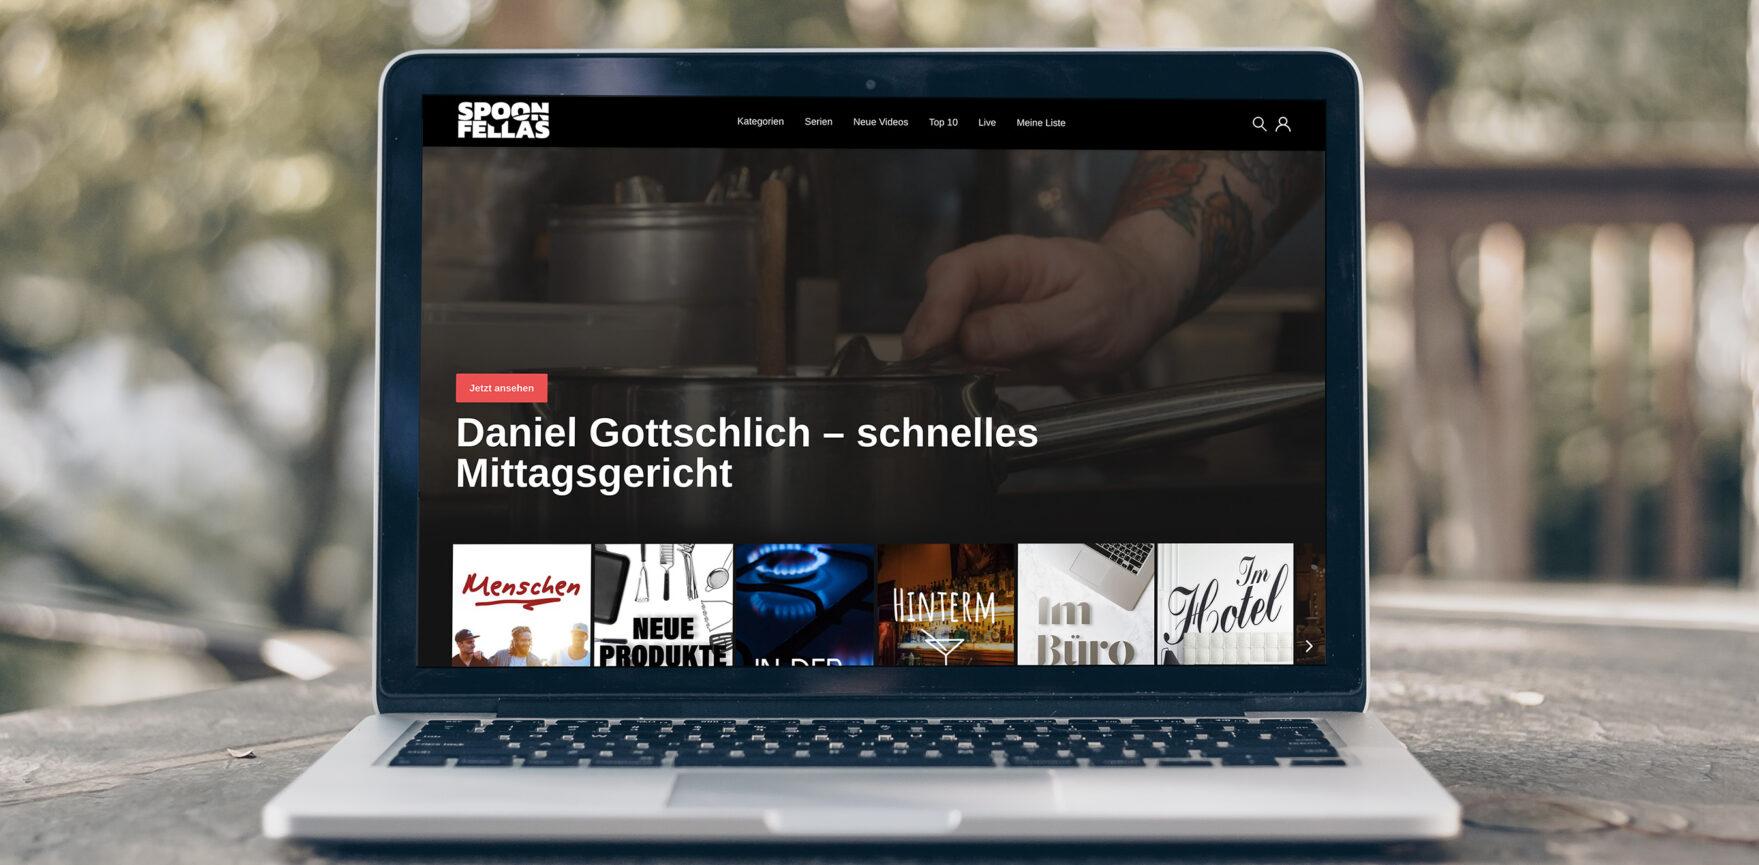 Spoon Fellas Videoplattform Website Desktop Laptop